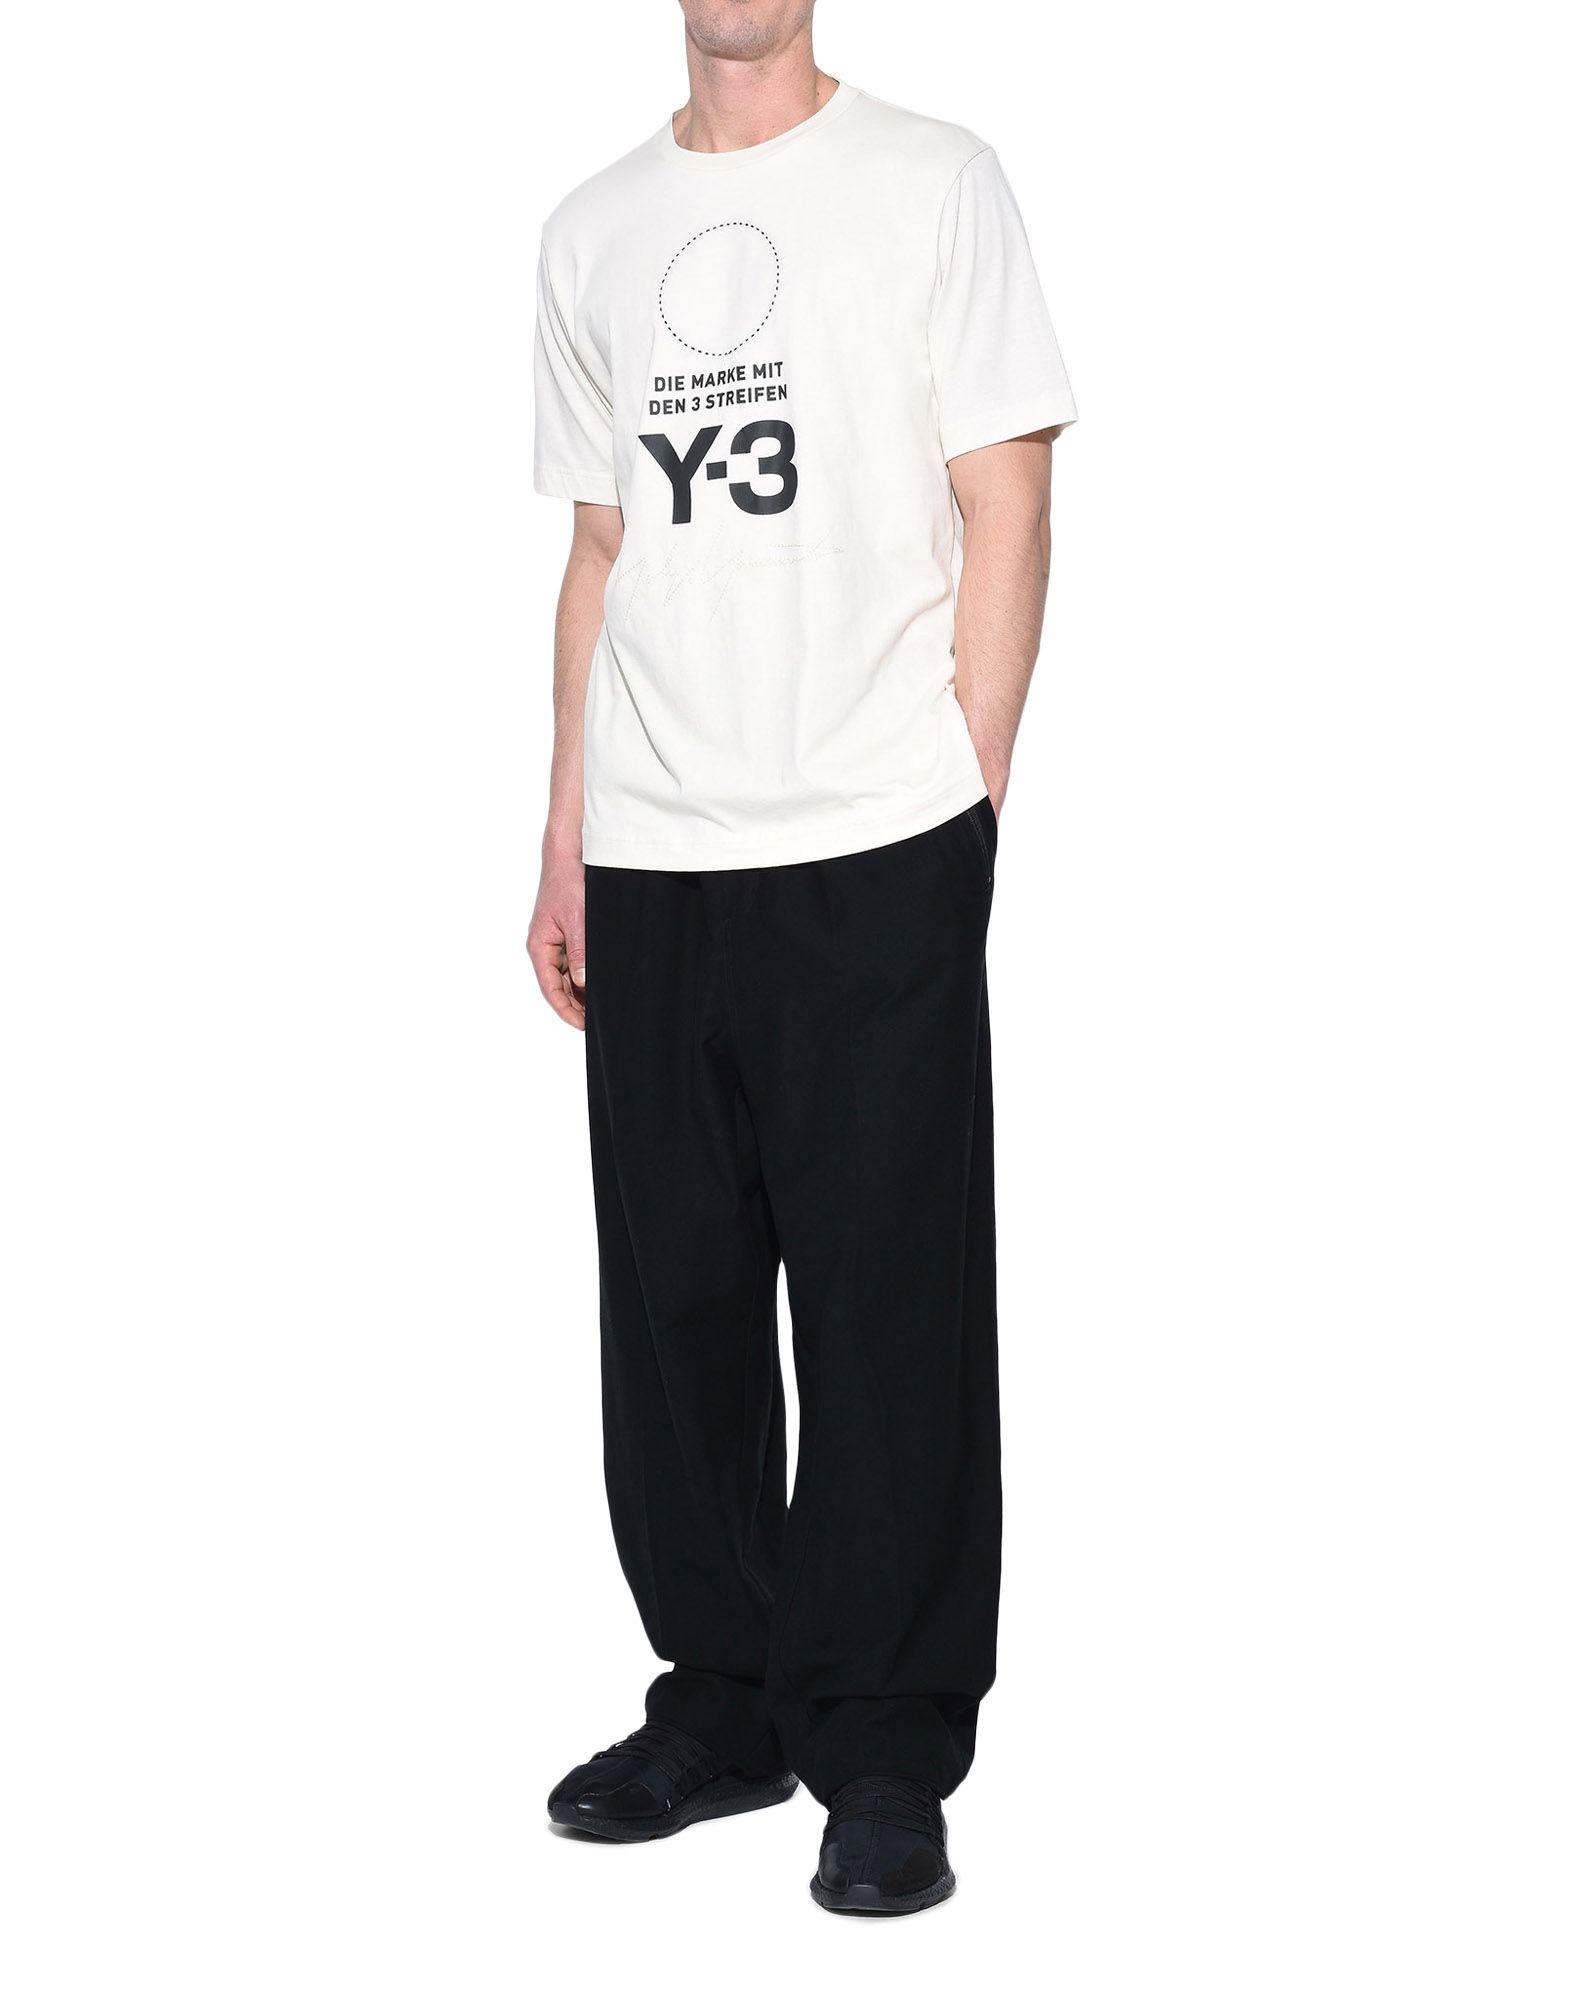 Y-3 Y-3 Stacked Logo Tee Short sleeve t-shirt Man a